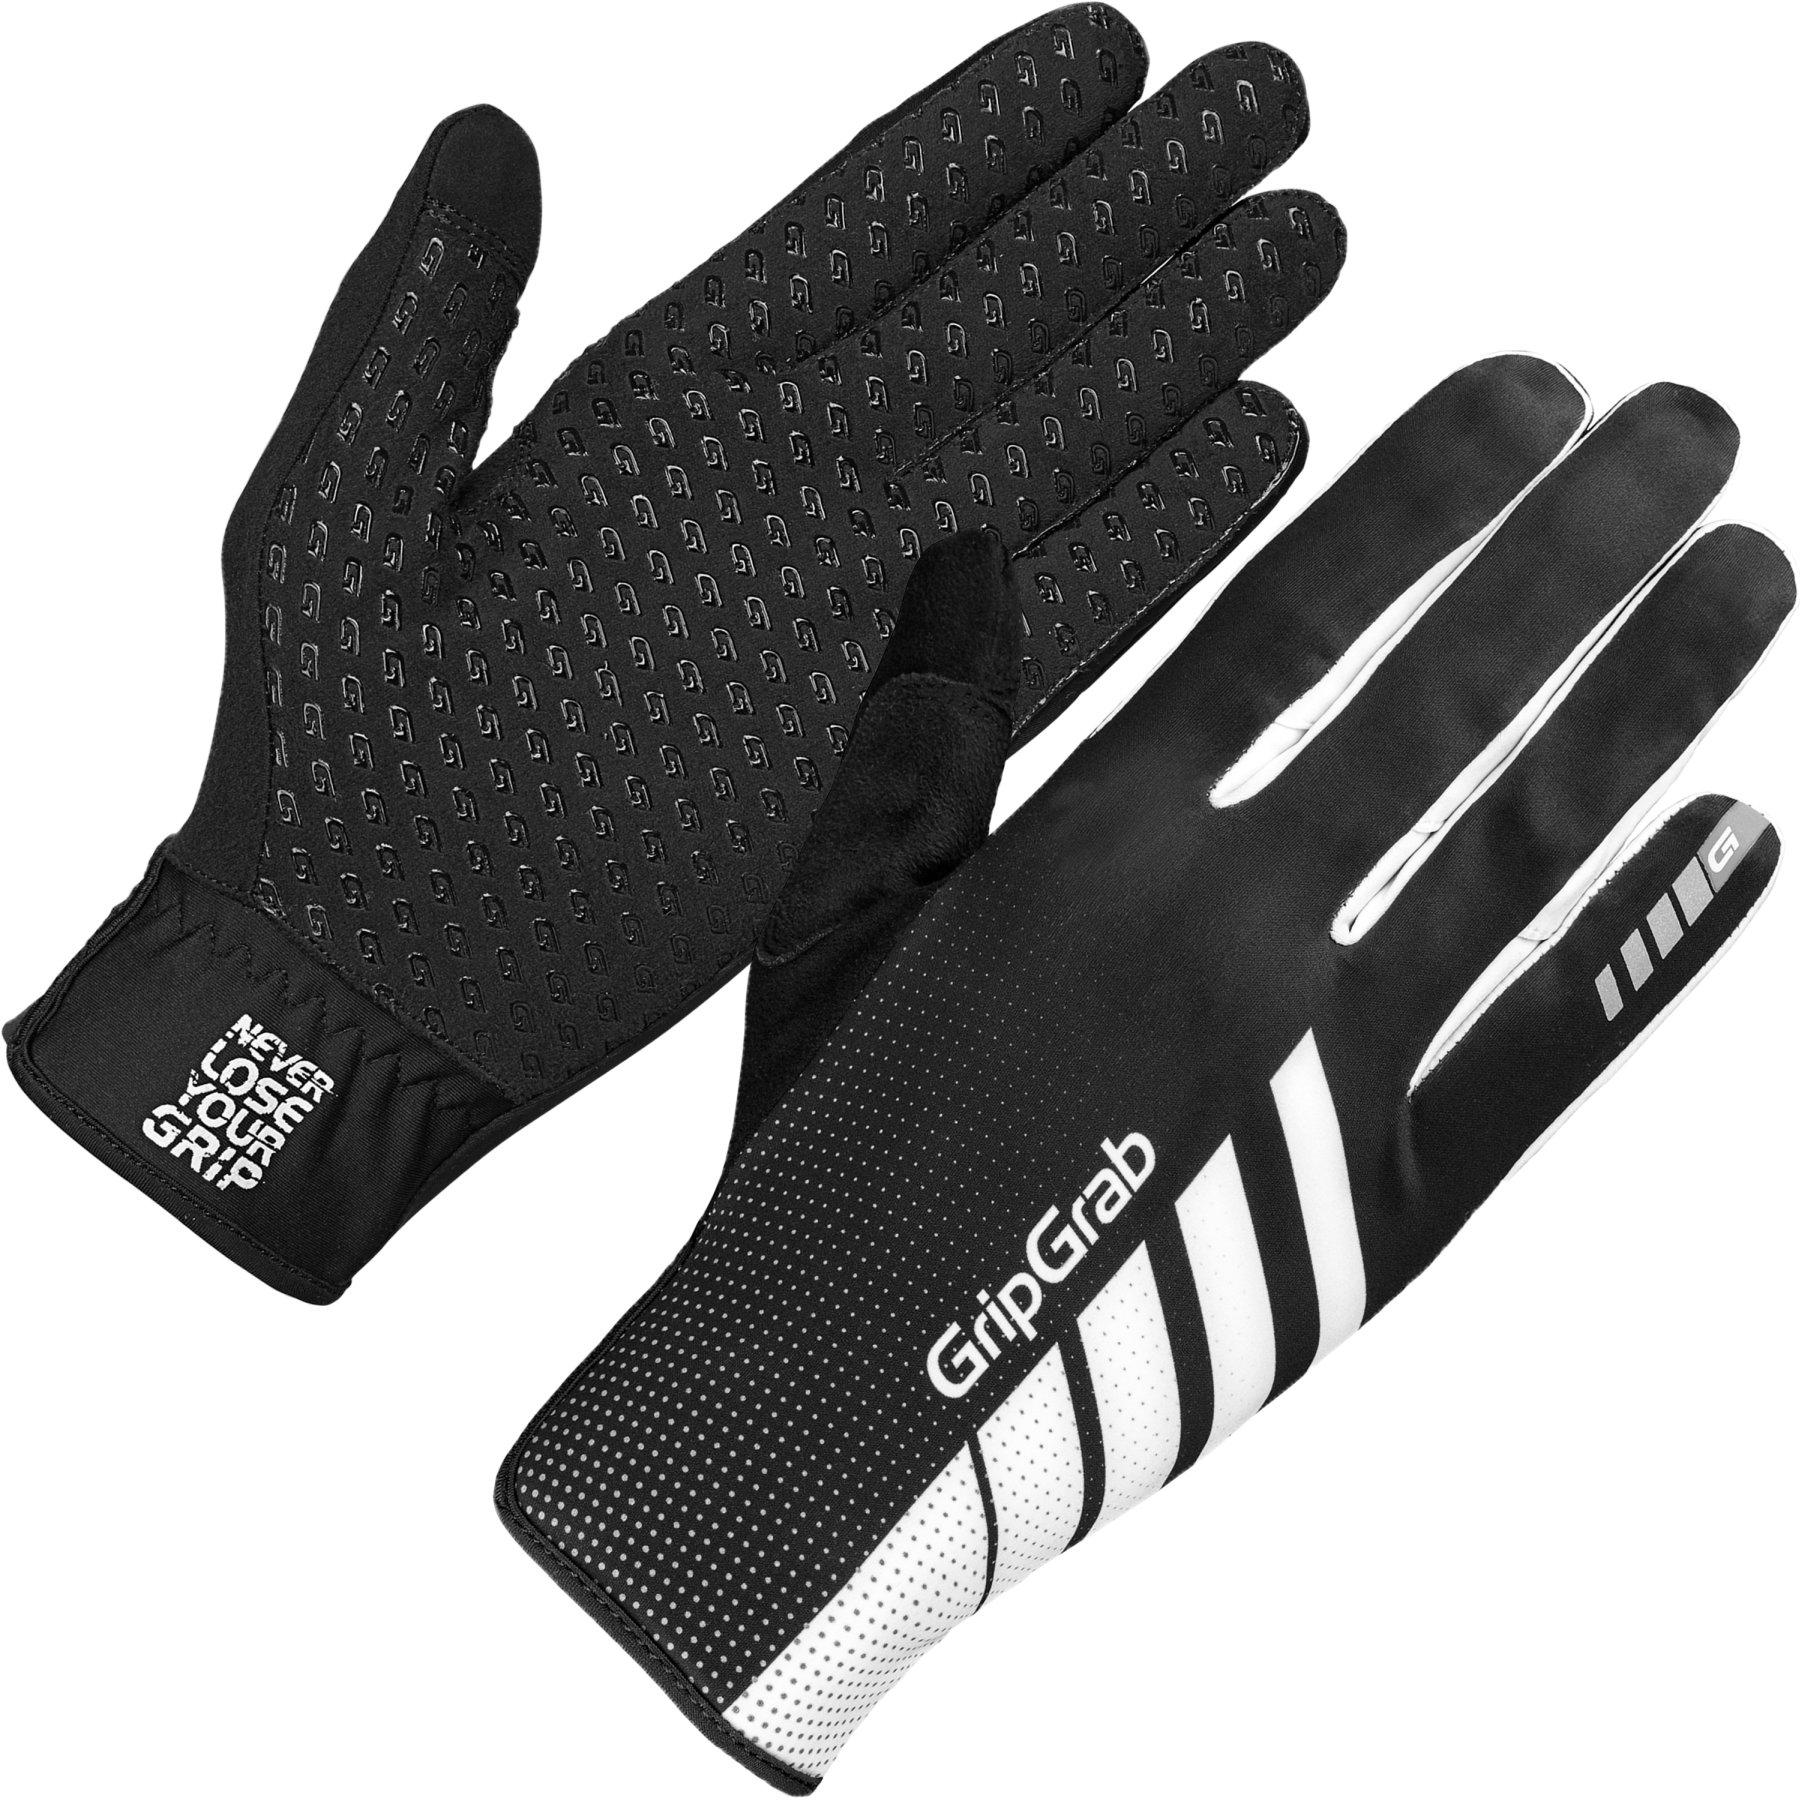 GripGrab Raptor Windproof Lightweight Raceday Winter Glove - Black/White